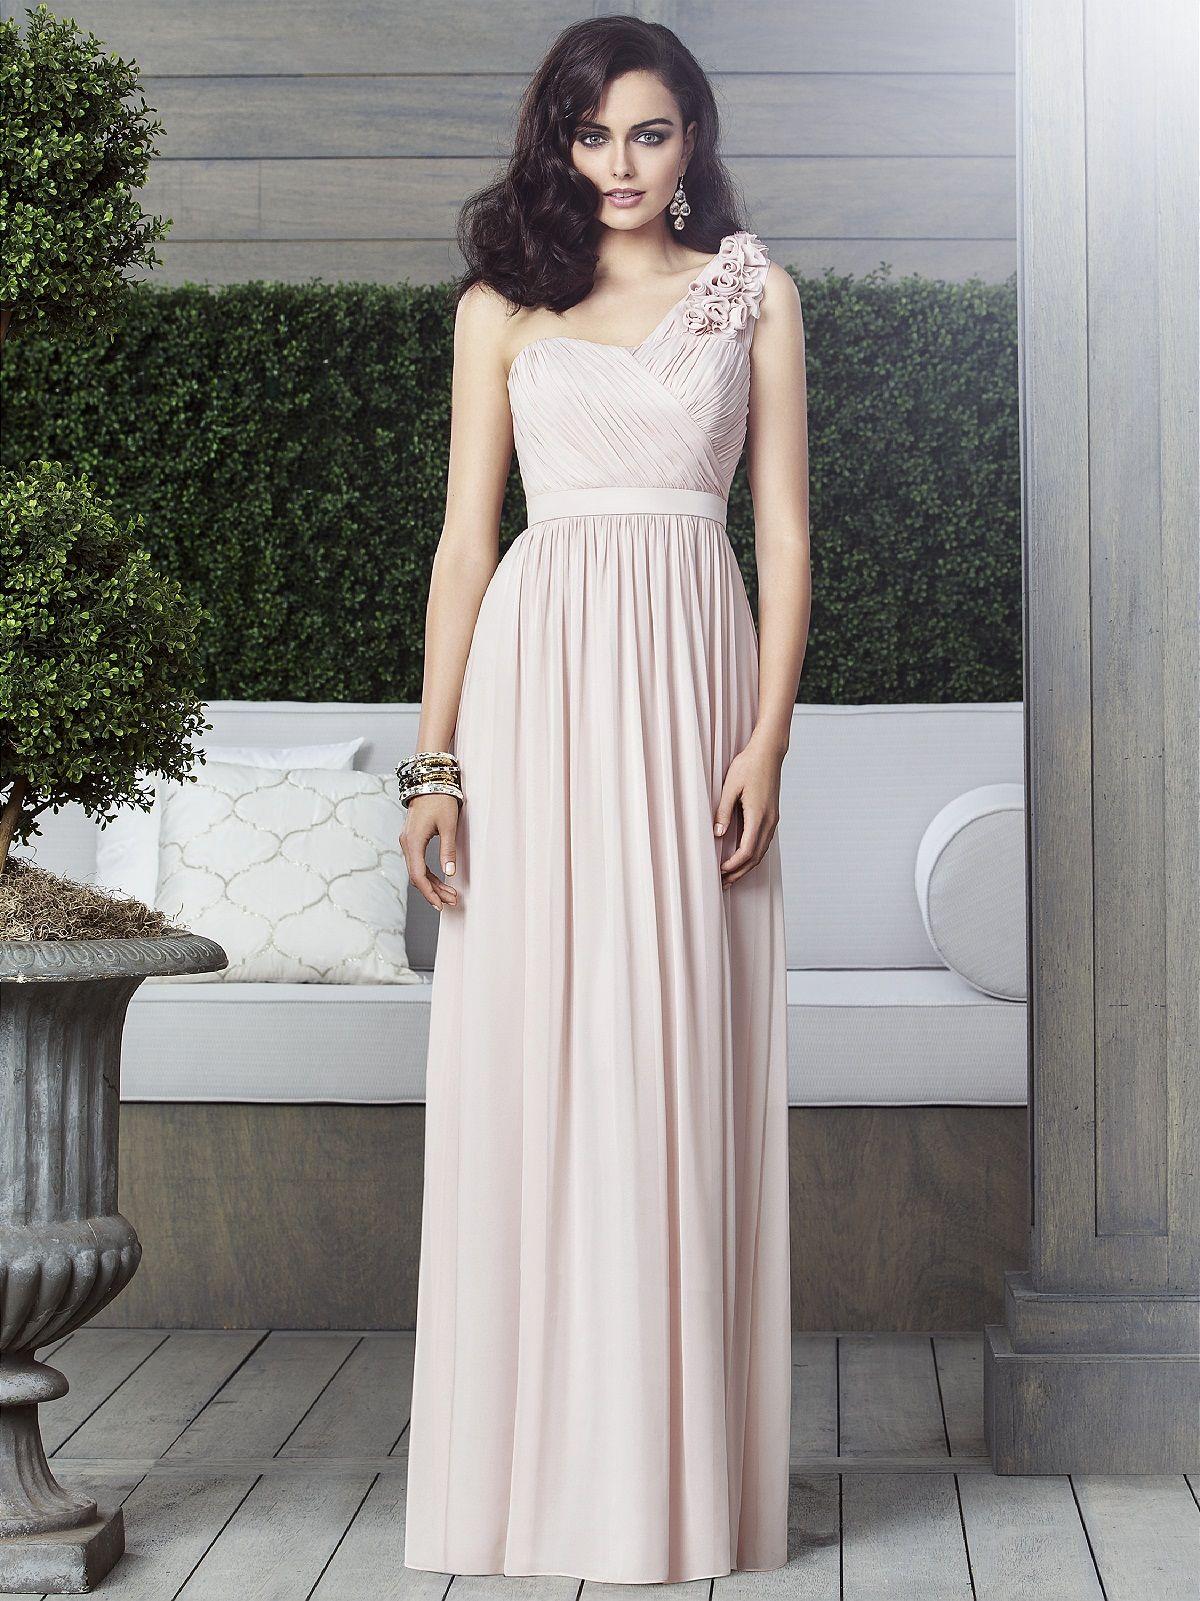 Dessy Bridesmaid Dress Style 2909 $195.00 | The Bridal Box ~ Wedding ...